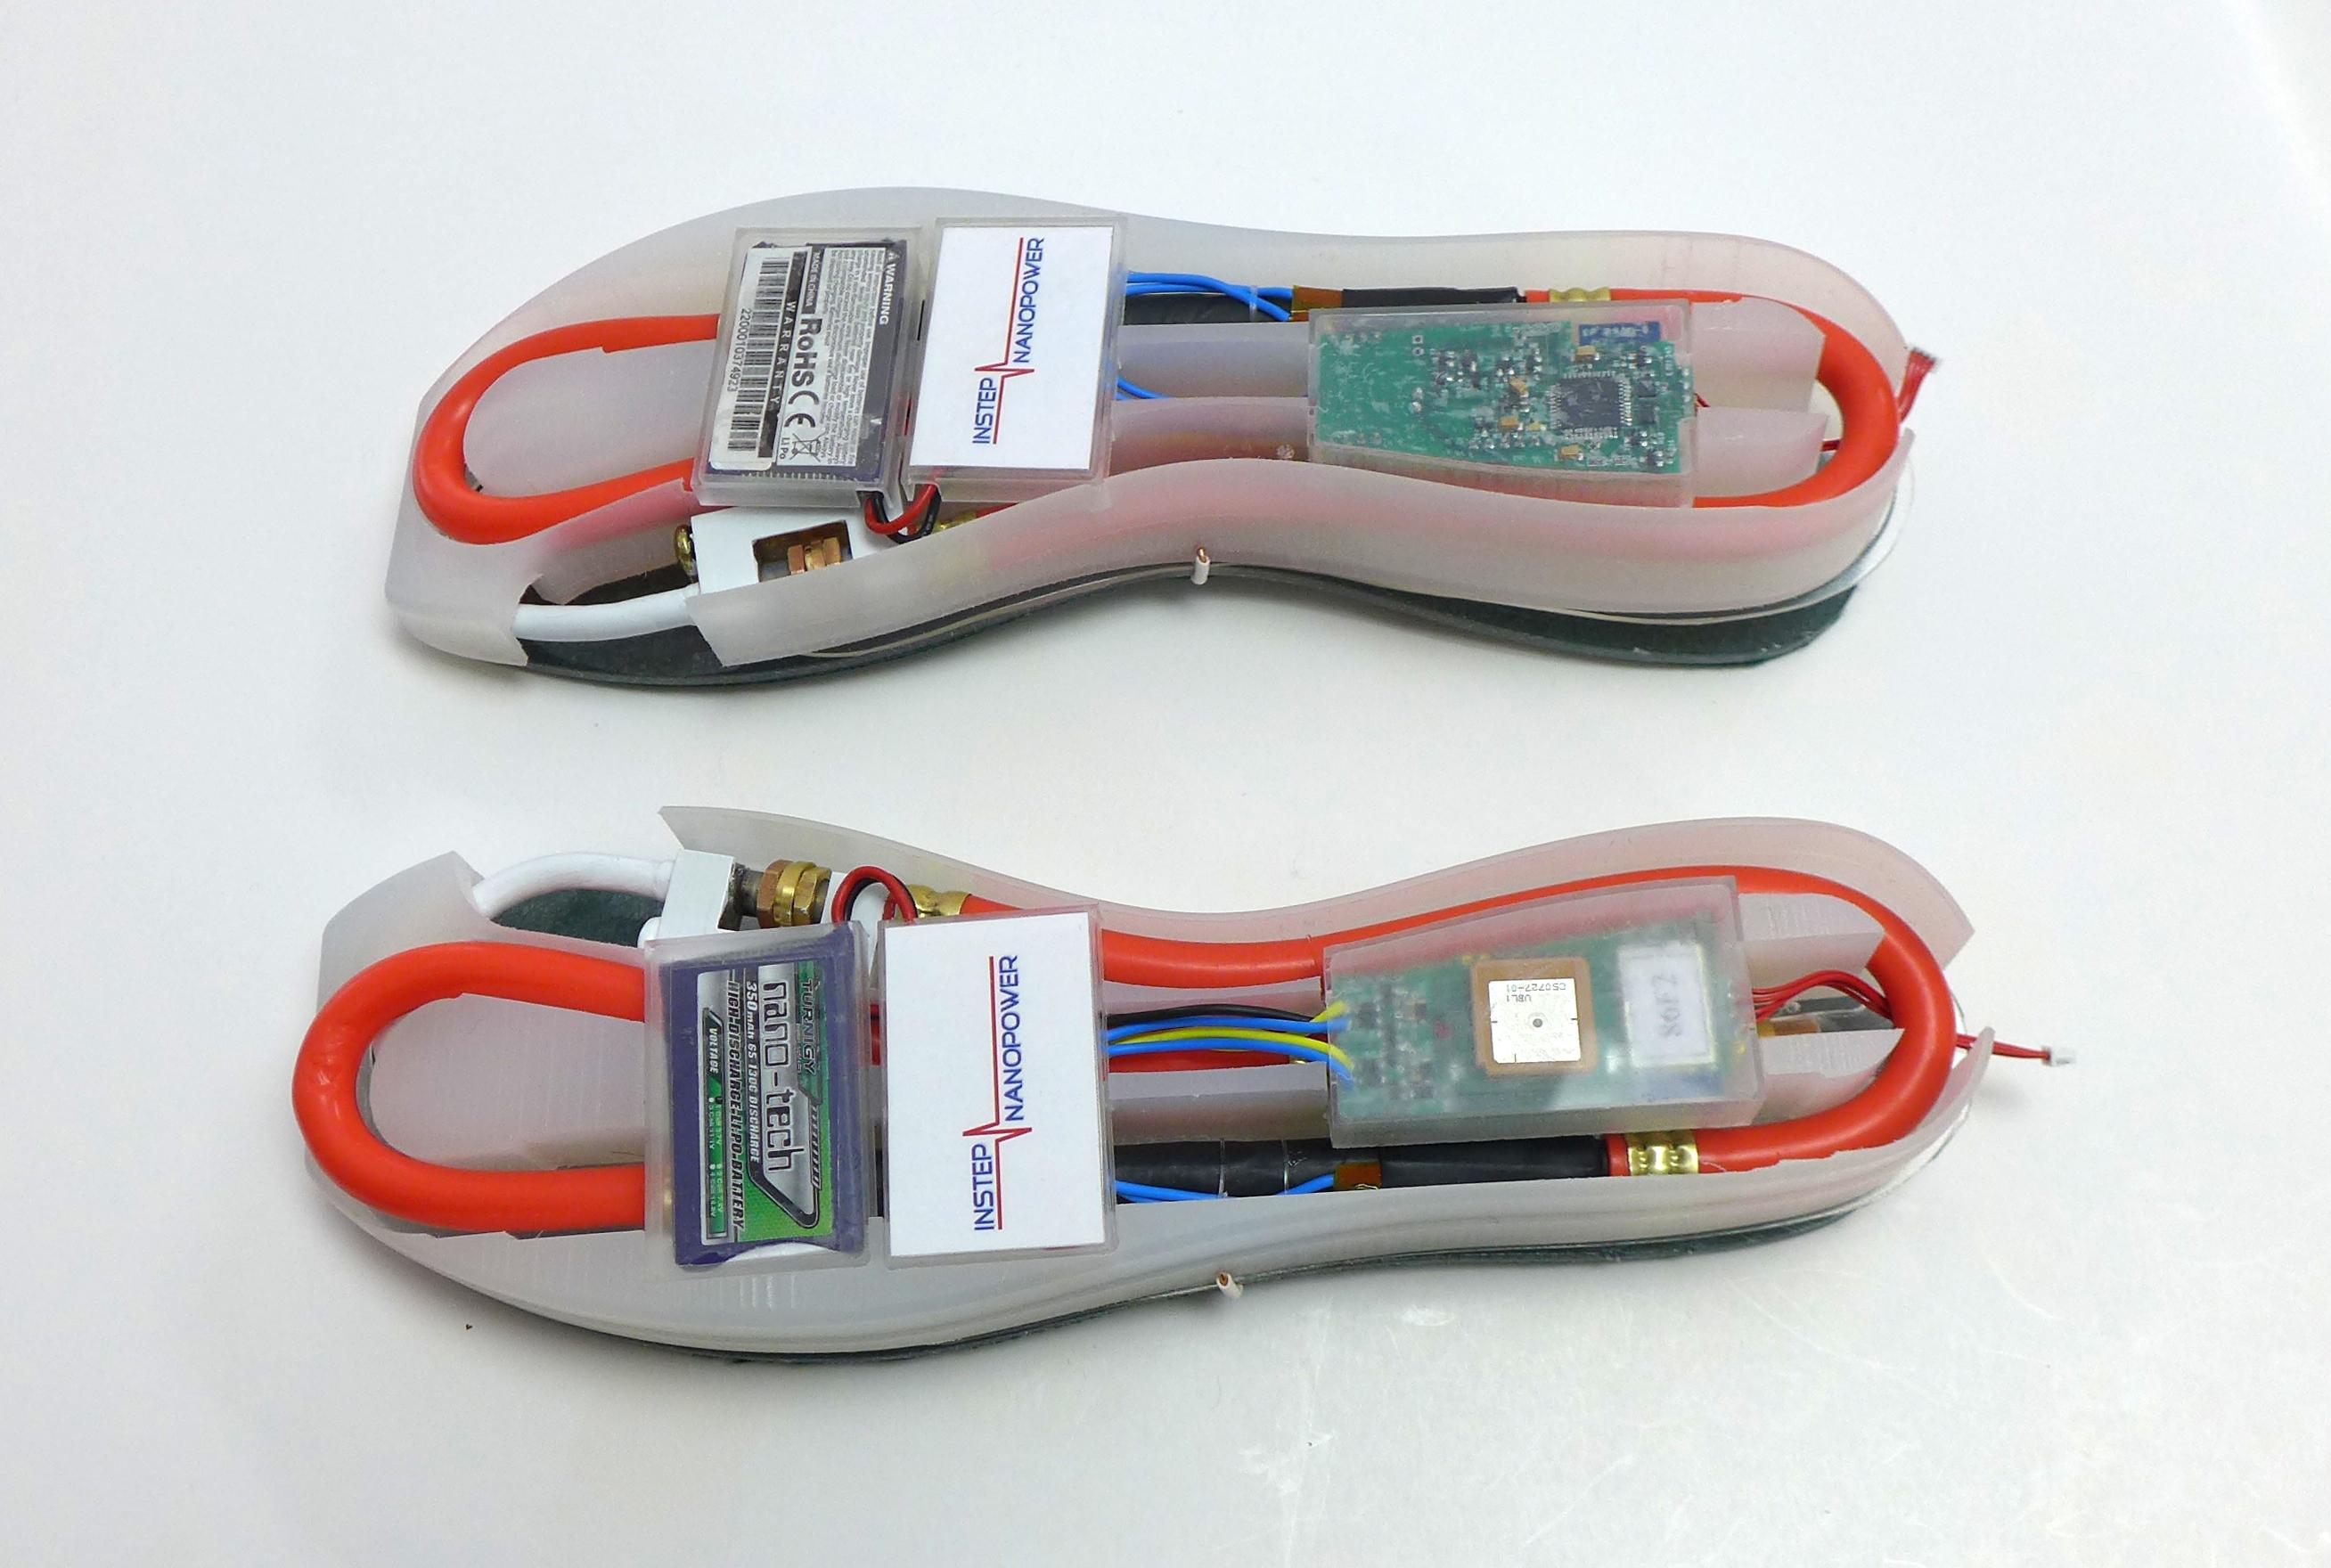 Pantofi care produc energie